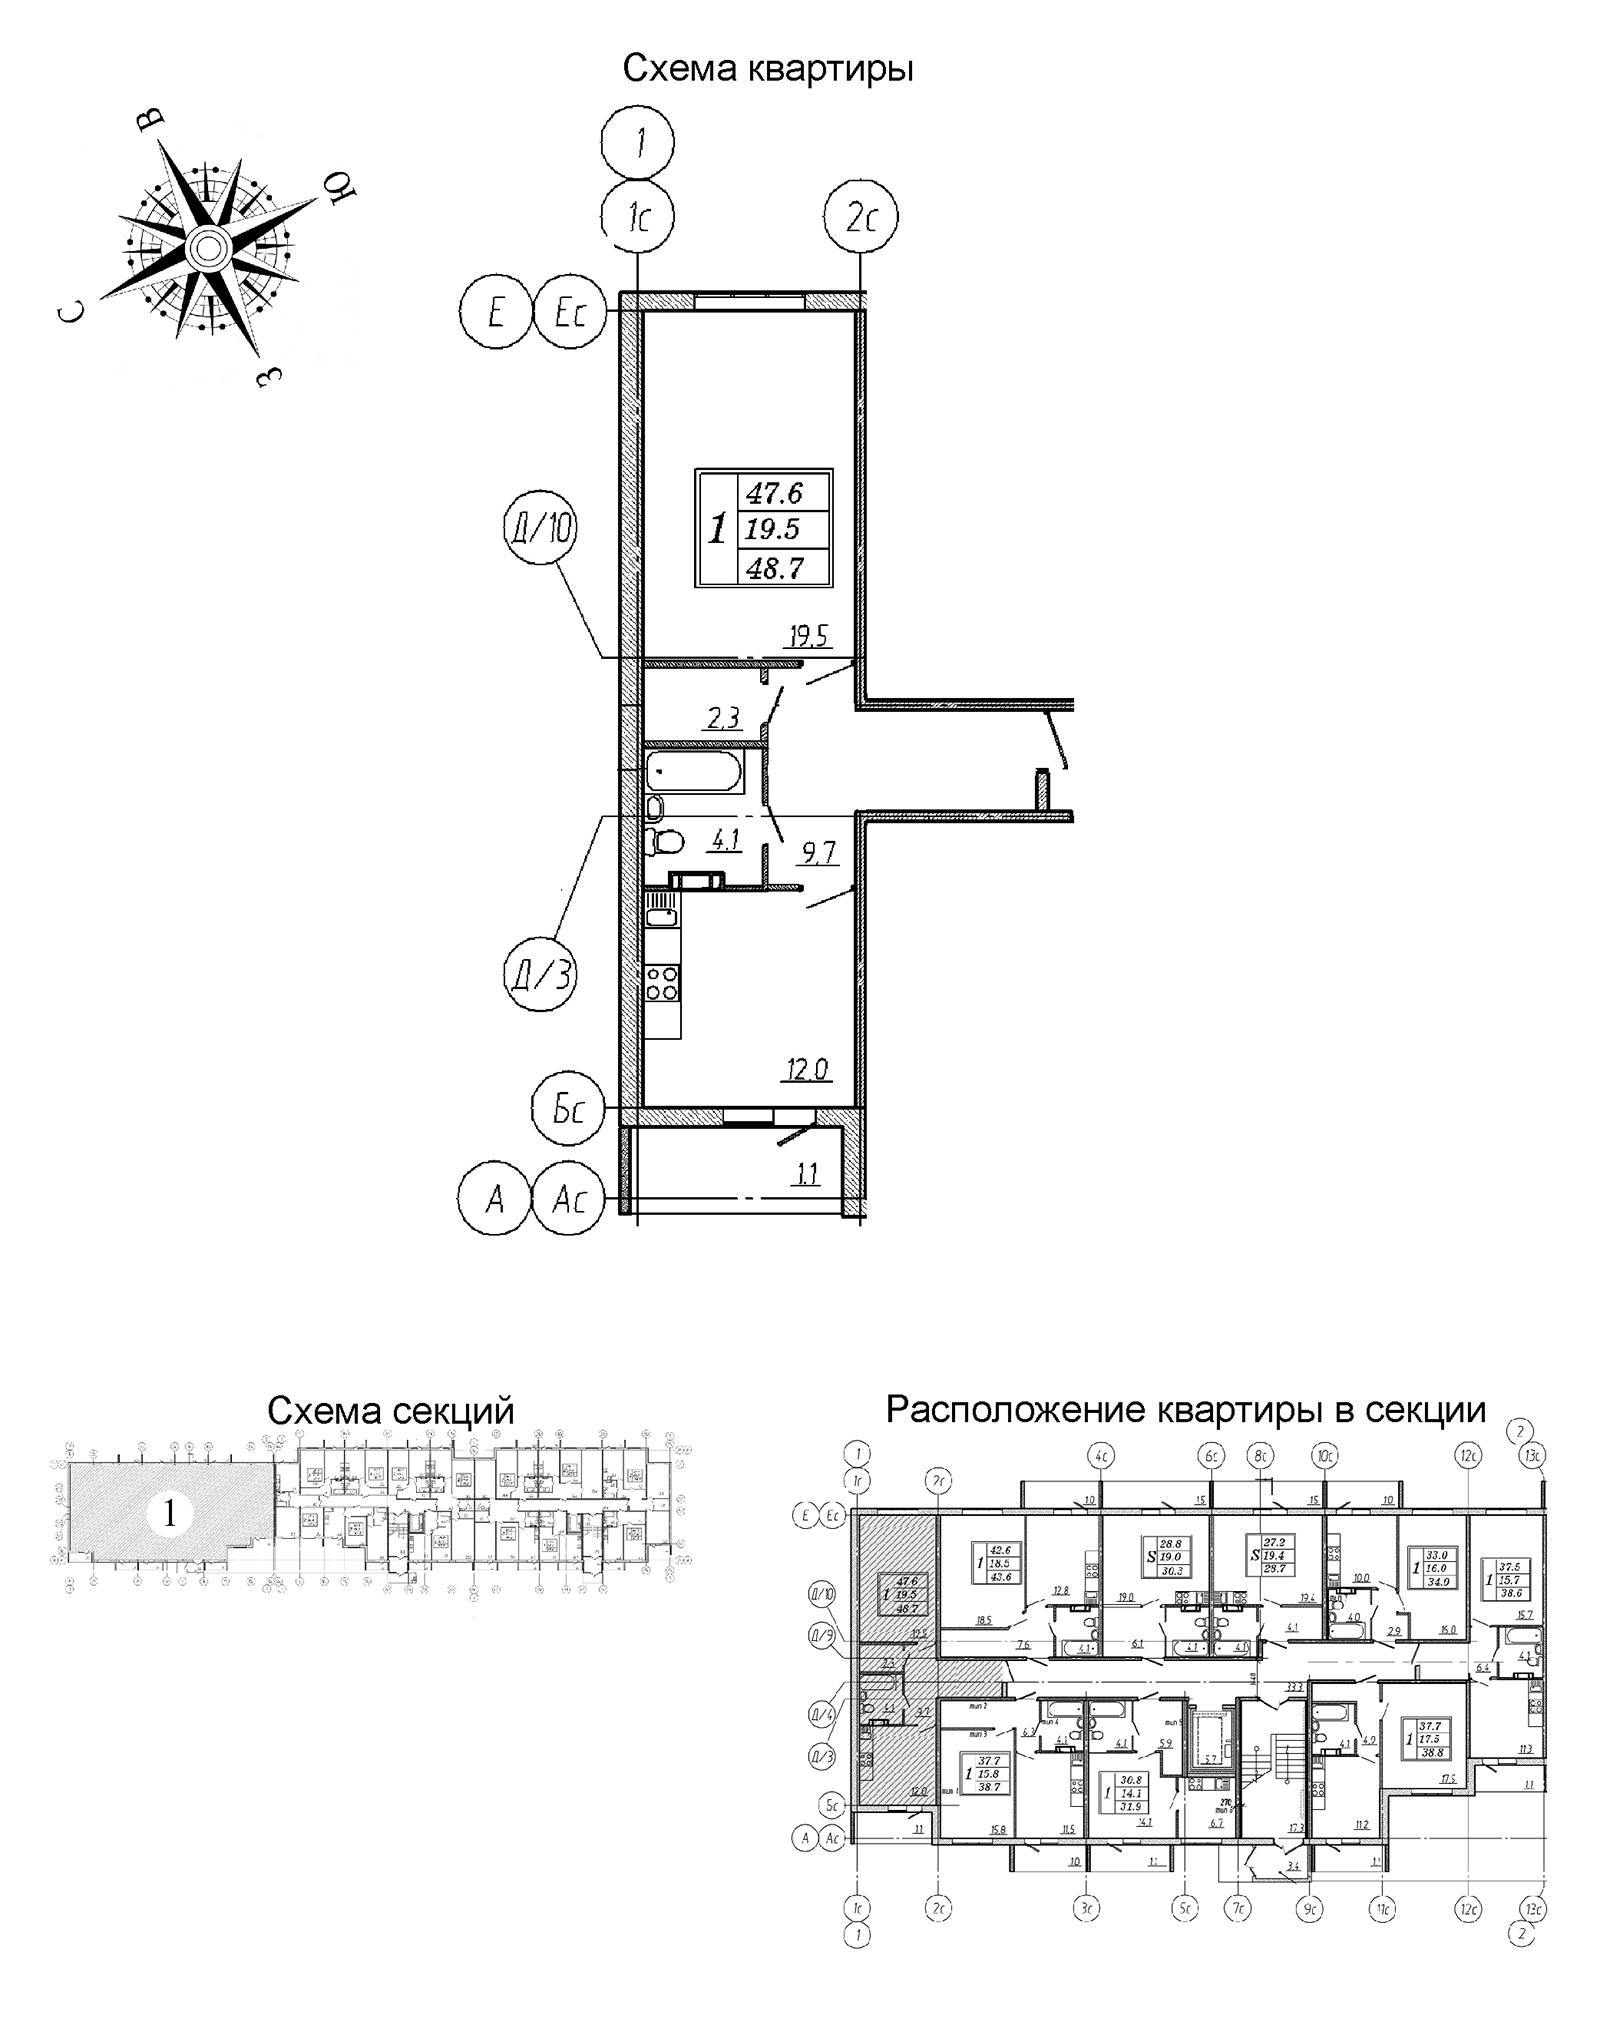 Однокомнатная квартира 49,3 м2